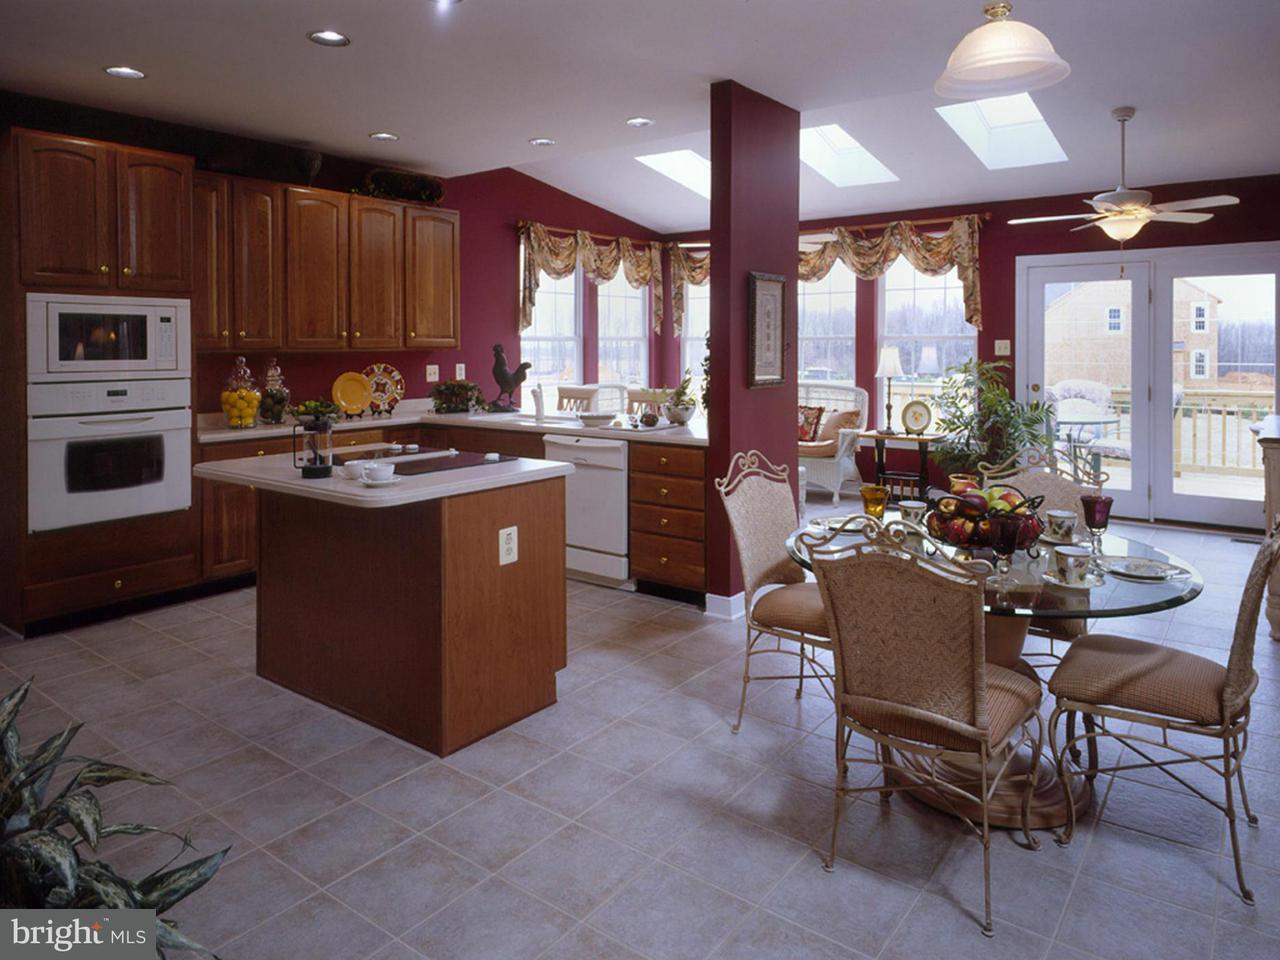 Additional photo for property listing at 3006 ROCKDALE Road 3006 ROCKDALE Road Freeland, Maryland 21053 United States